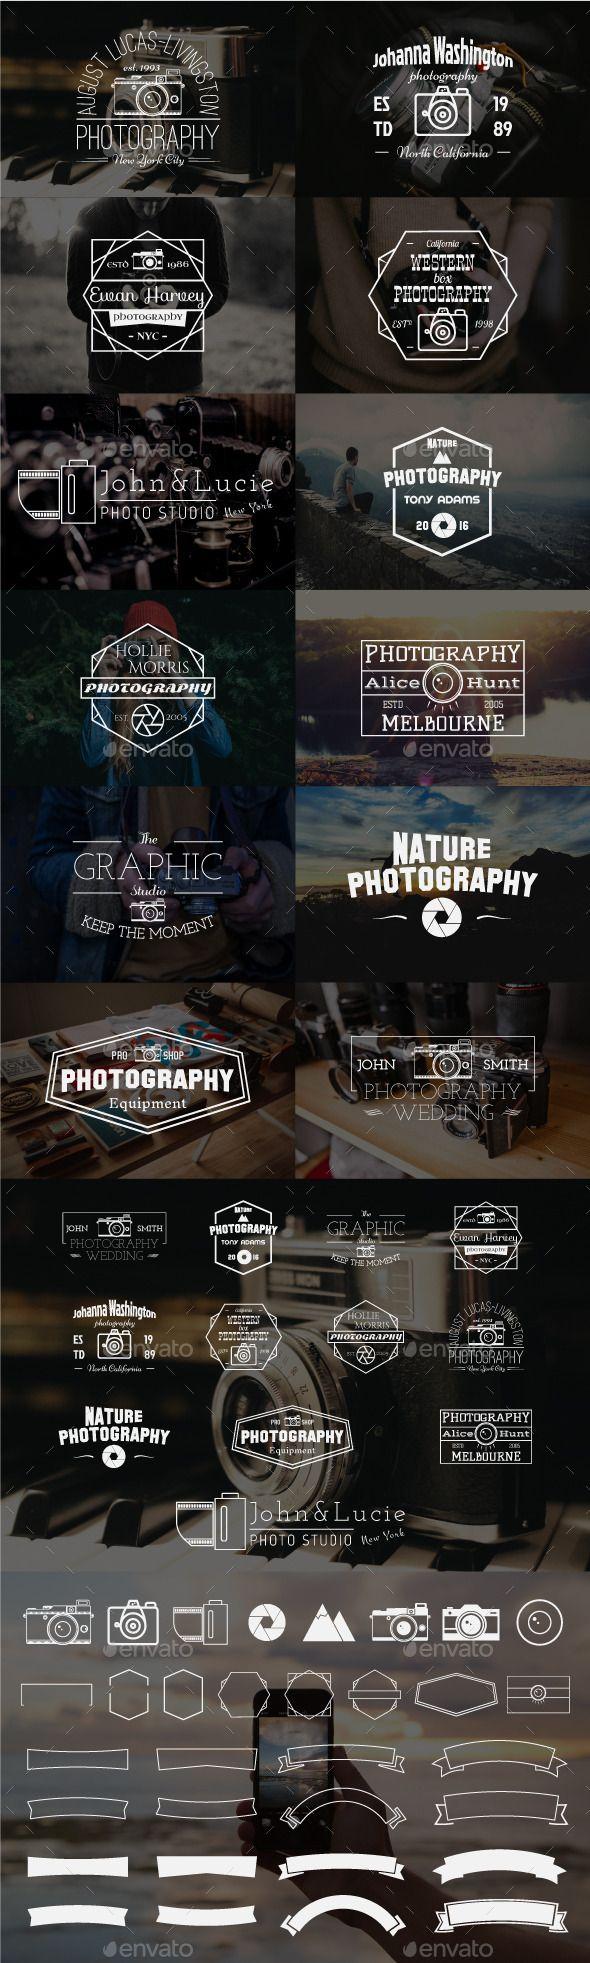 12 Vintage Photography Badges - Badges & Stickers Web Elements